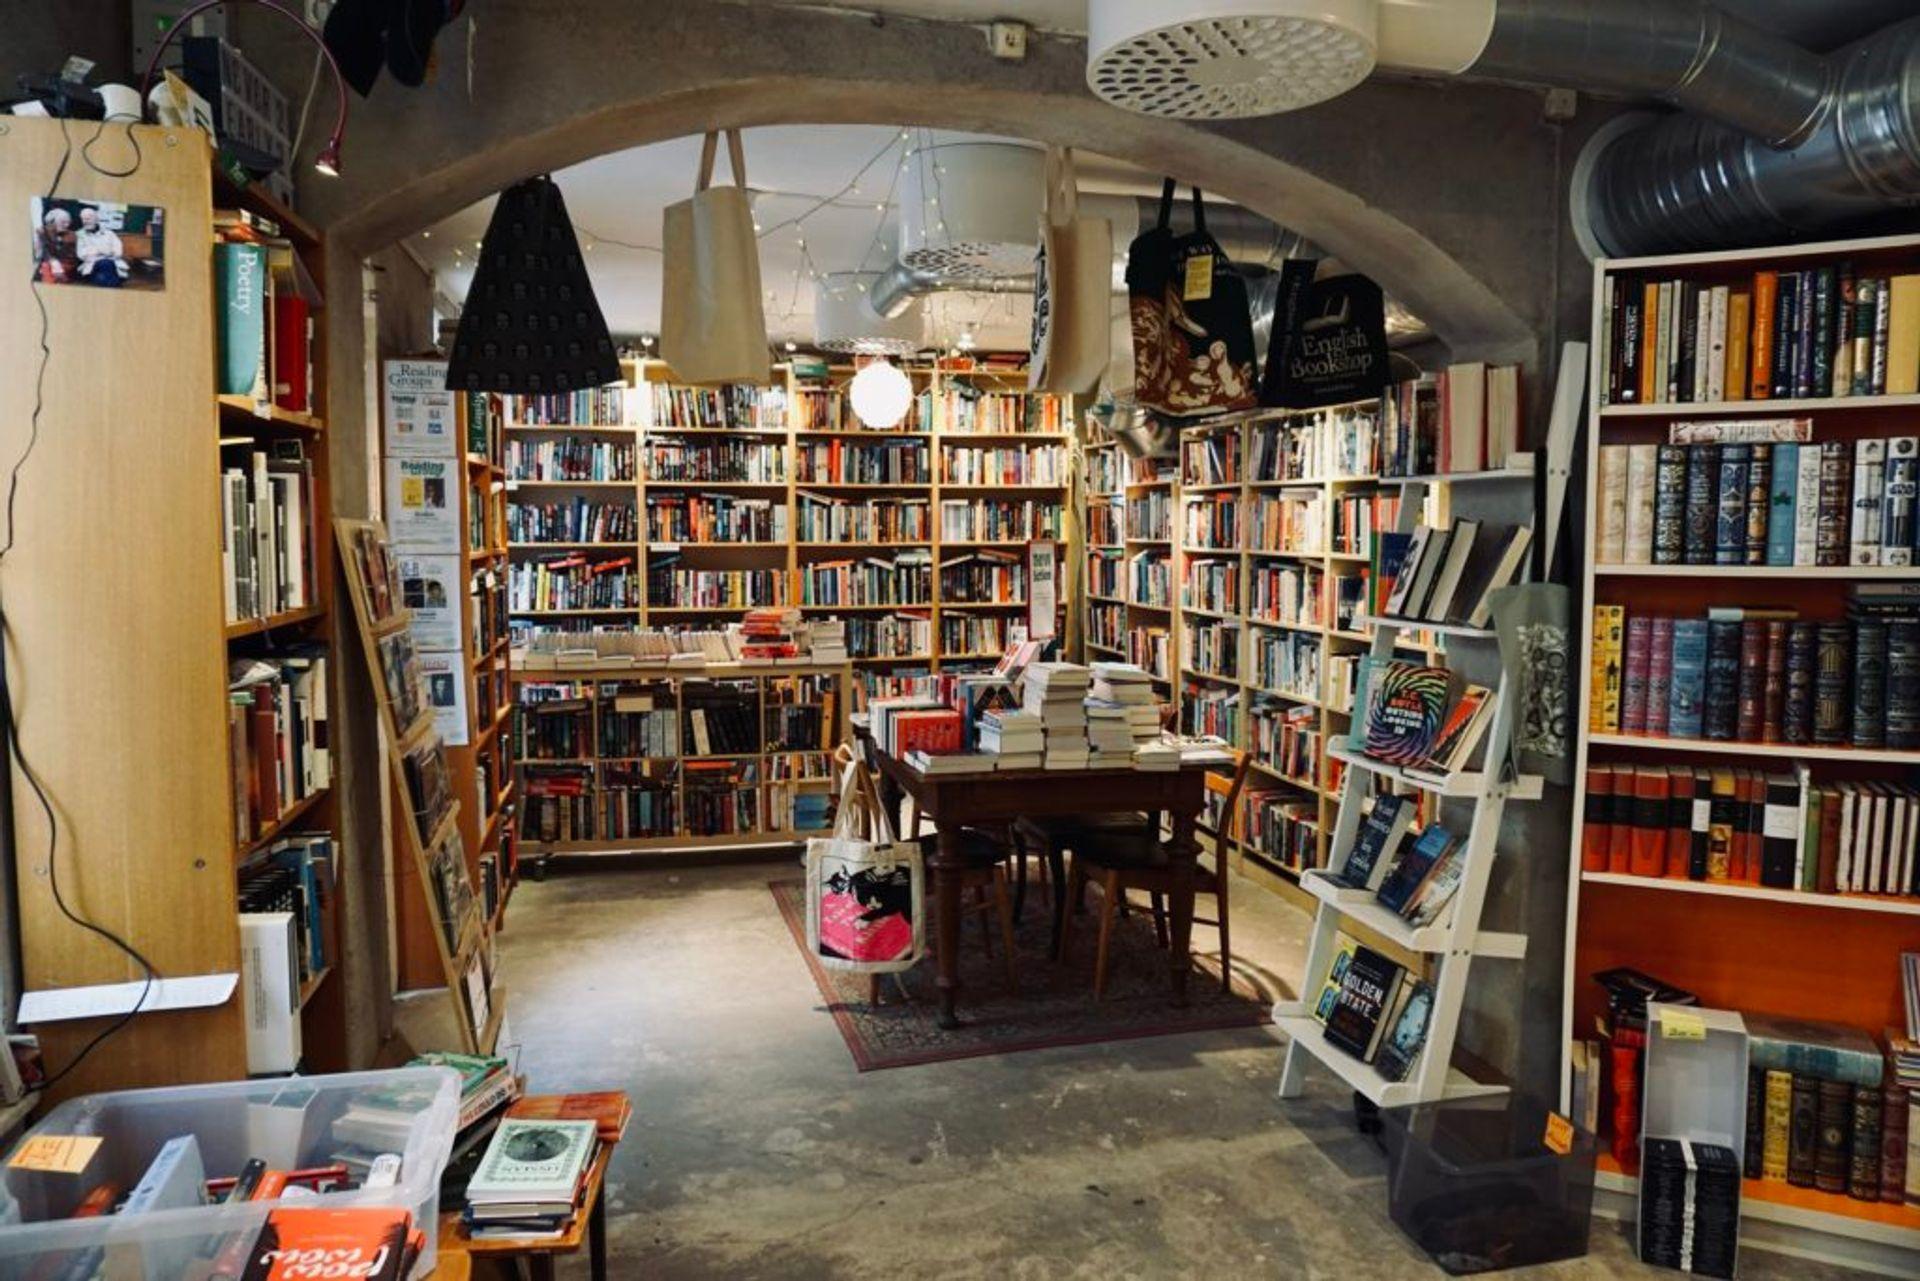 Inside a small bookshop.